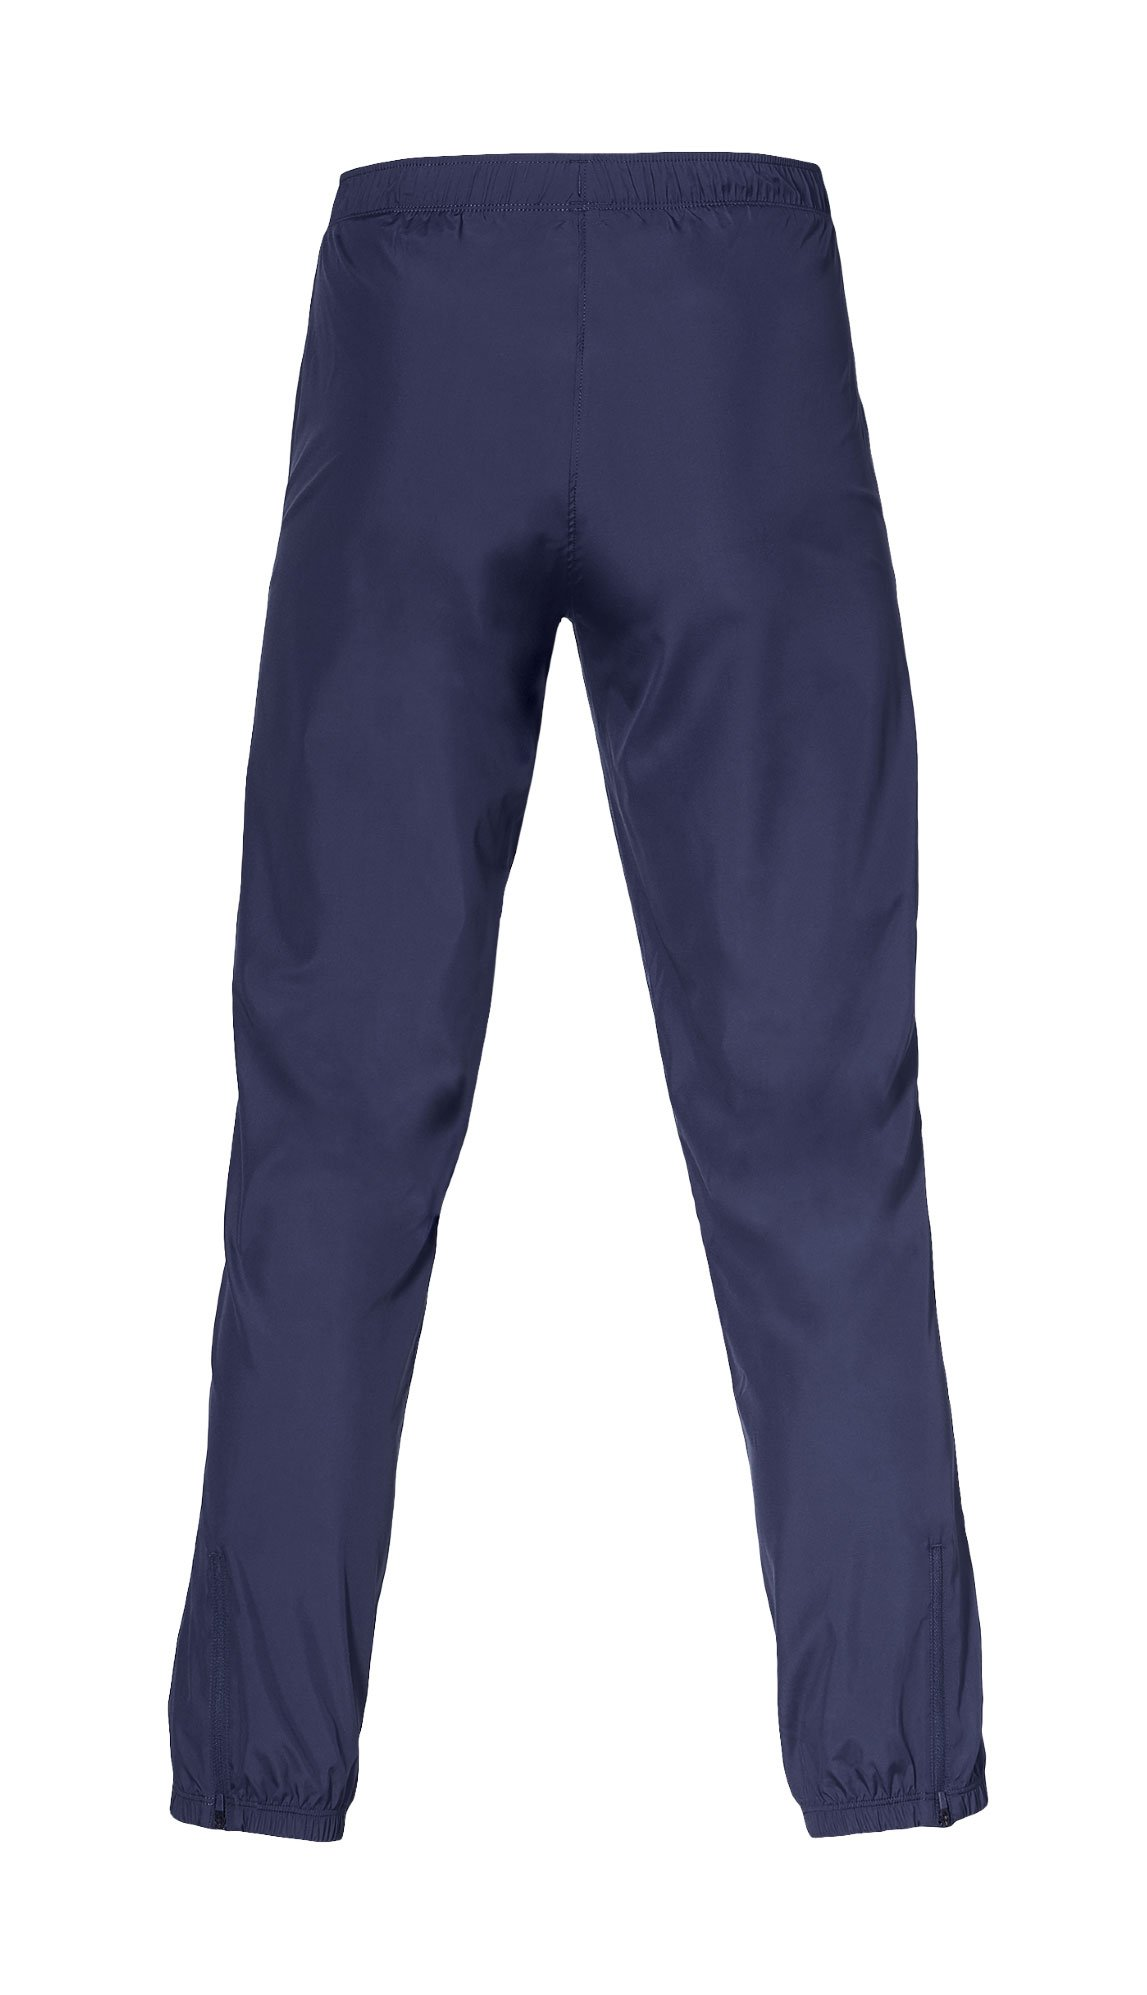 a6e143386f89c Купить штаны Asics Silver Woven Pant   Интернет-магазин RunLab